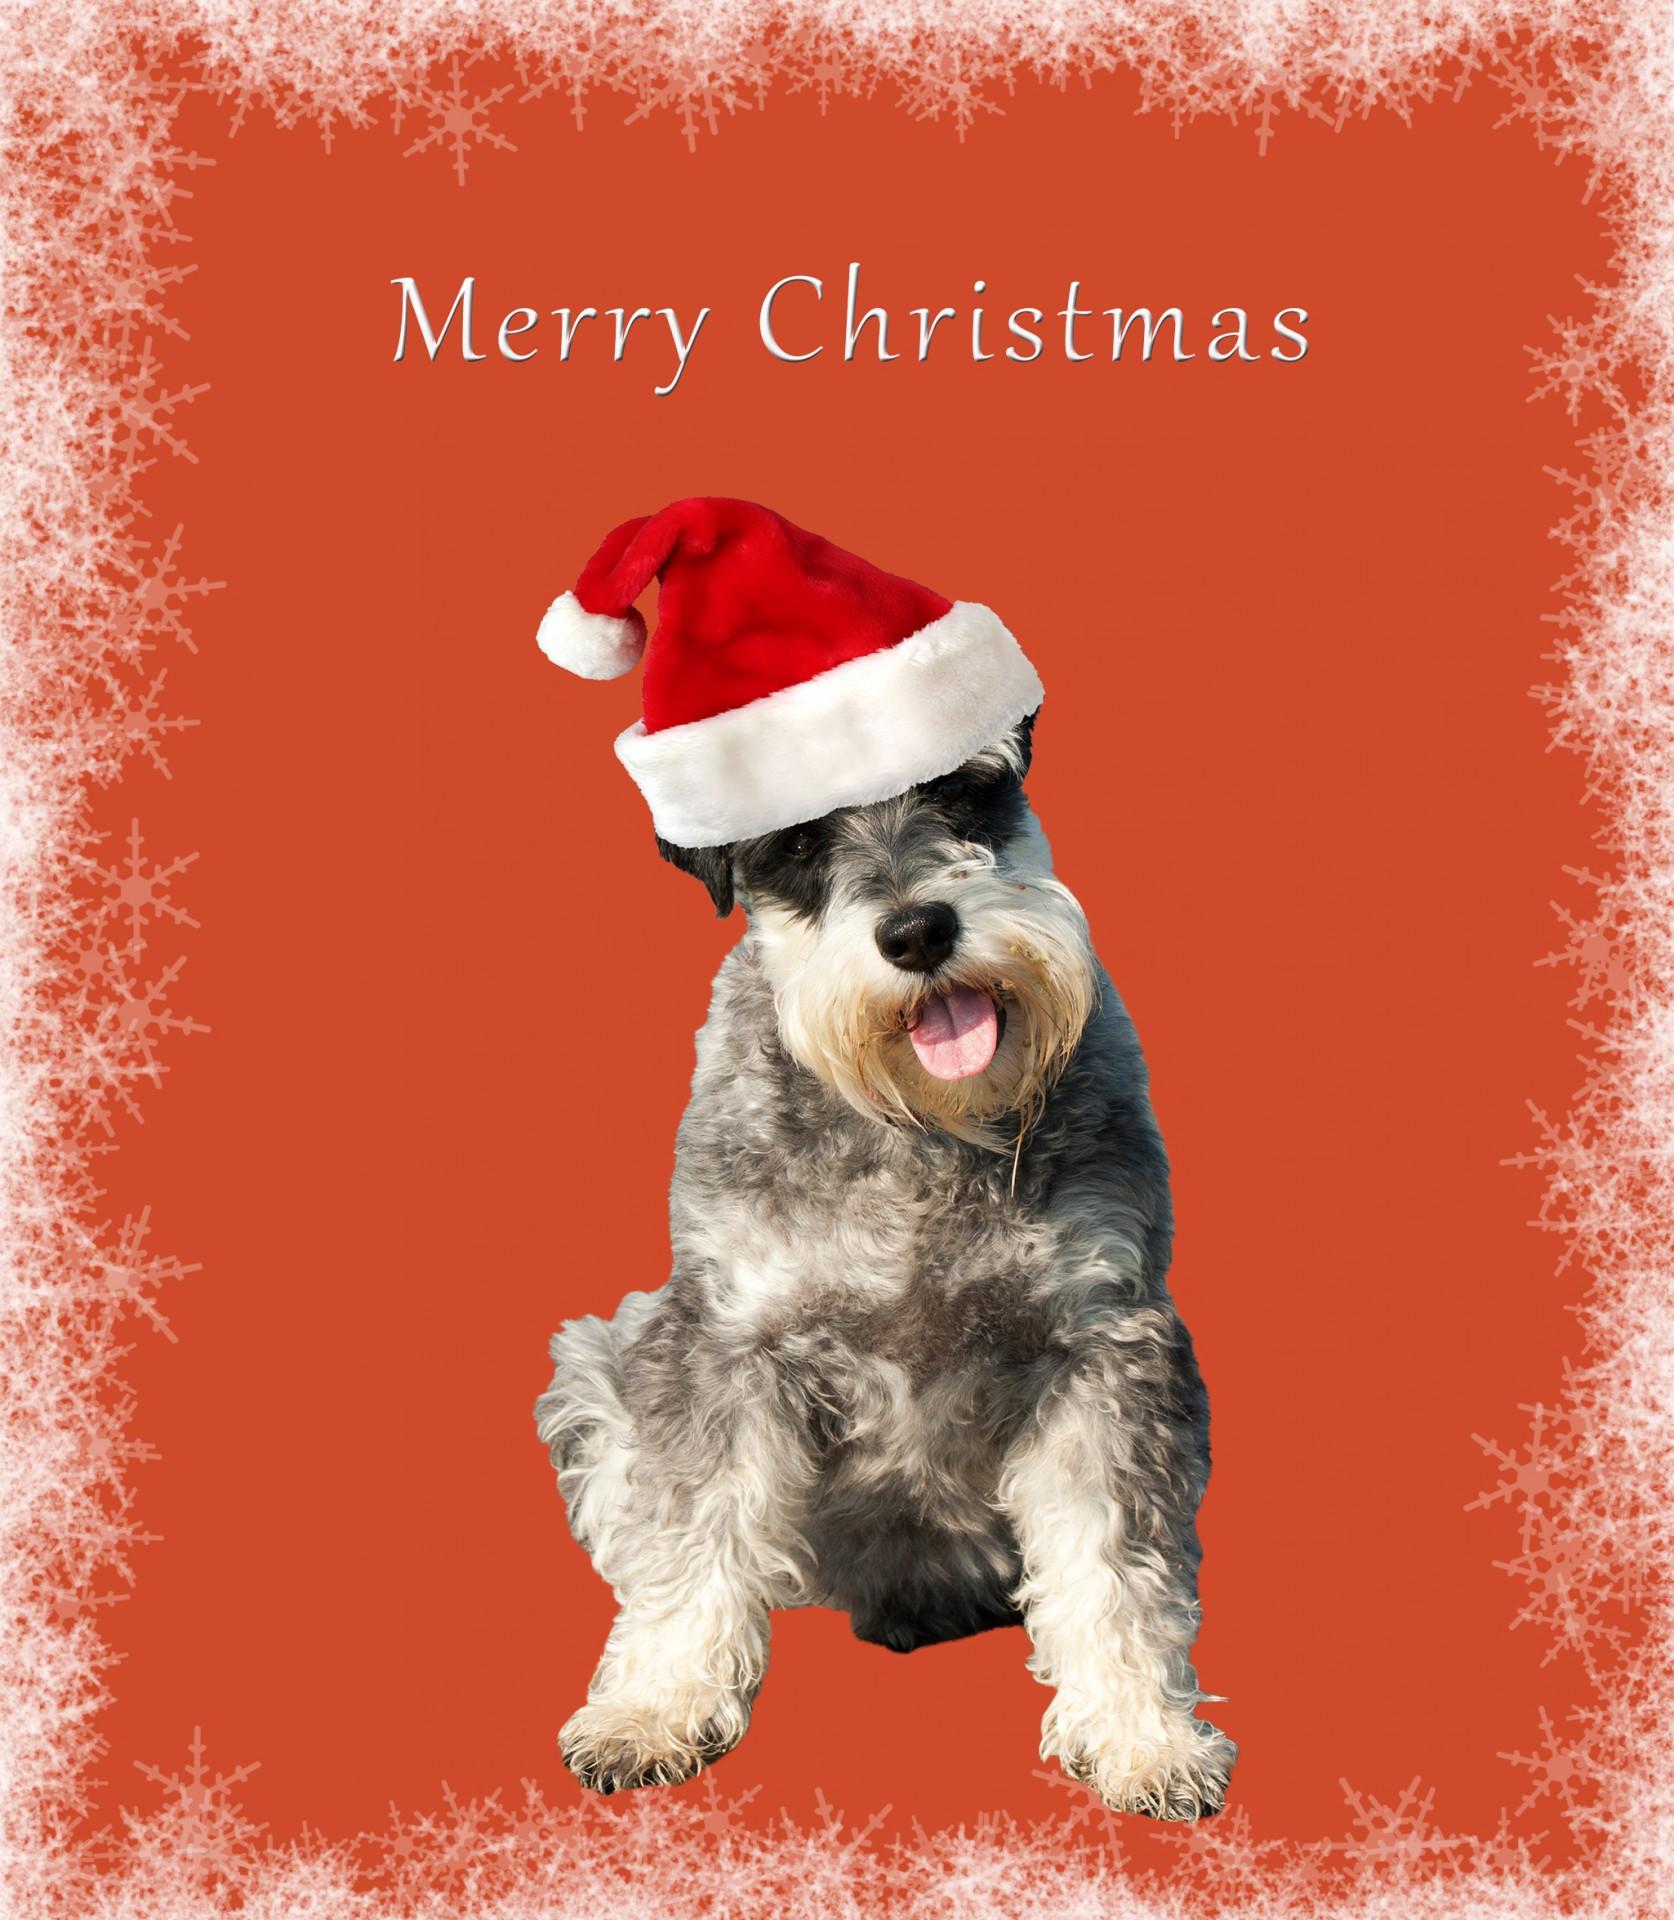 Dogschnauzerminiaturenbspschnauzerchristmascard Free Photo